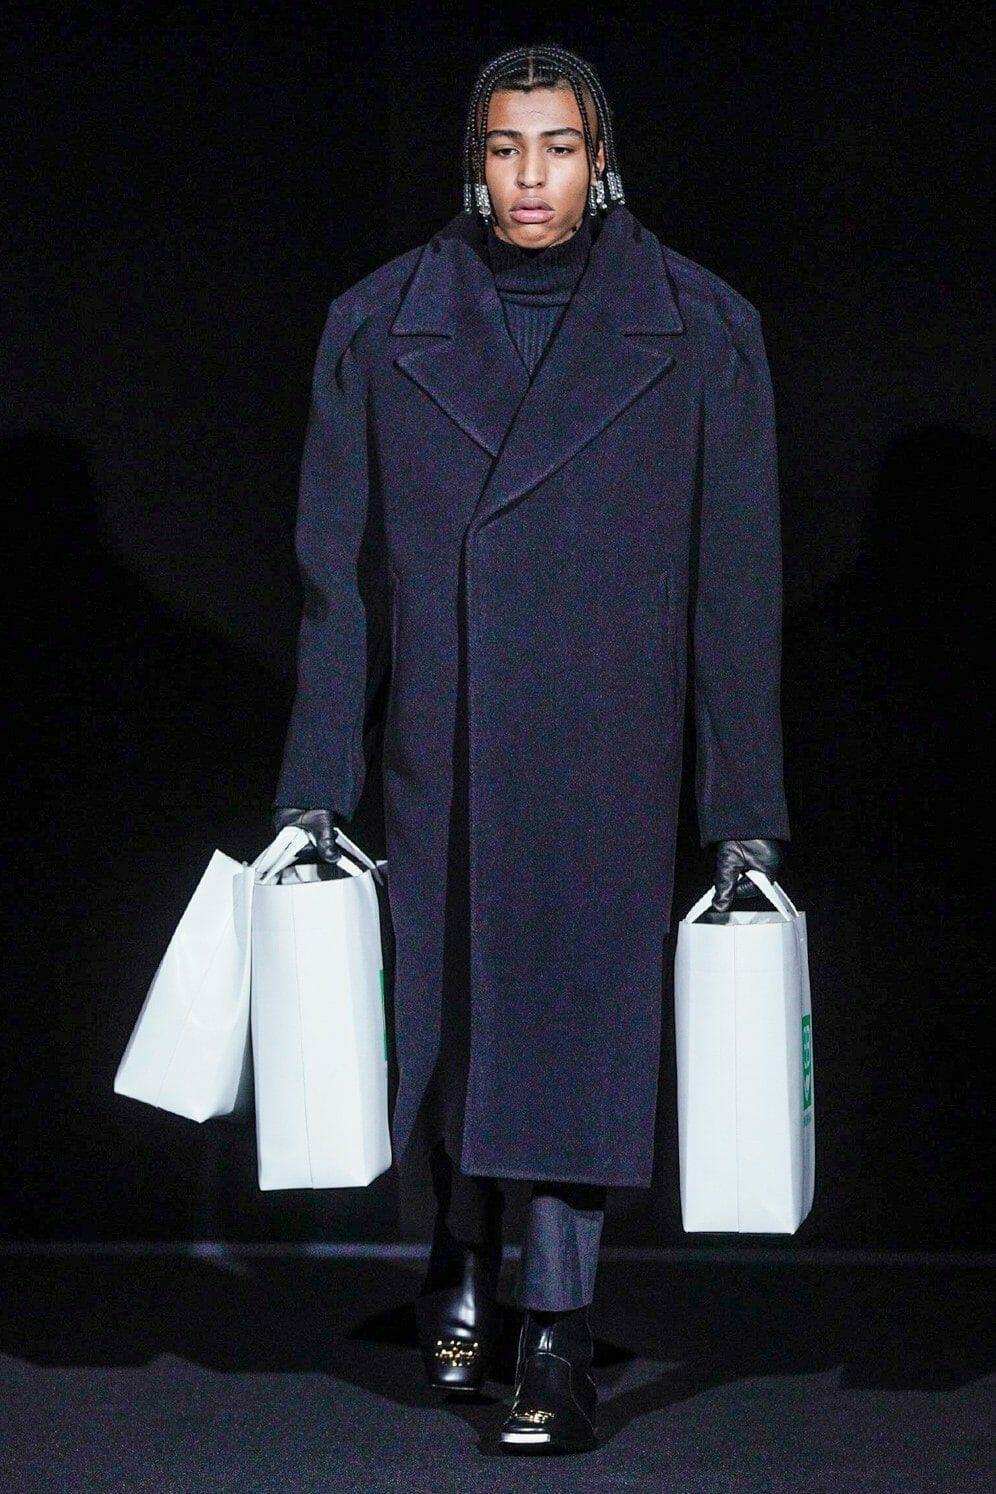 Balenciaga Ready-to-Wear Fall-Winter 2019-2020 by RUNWAY MAGAZINE